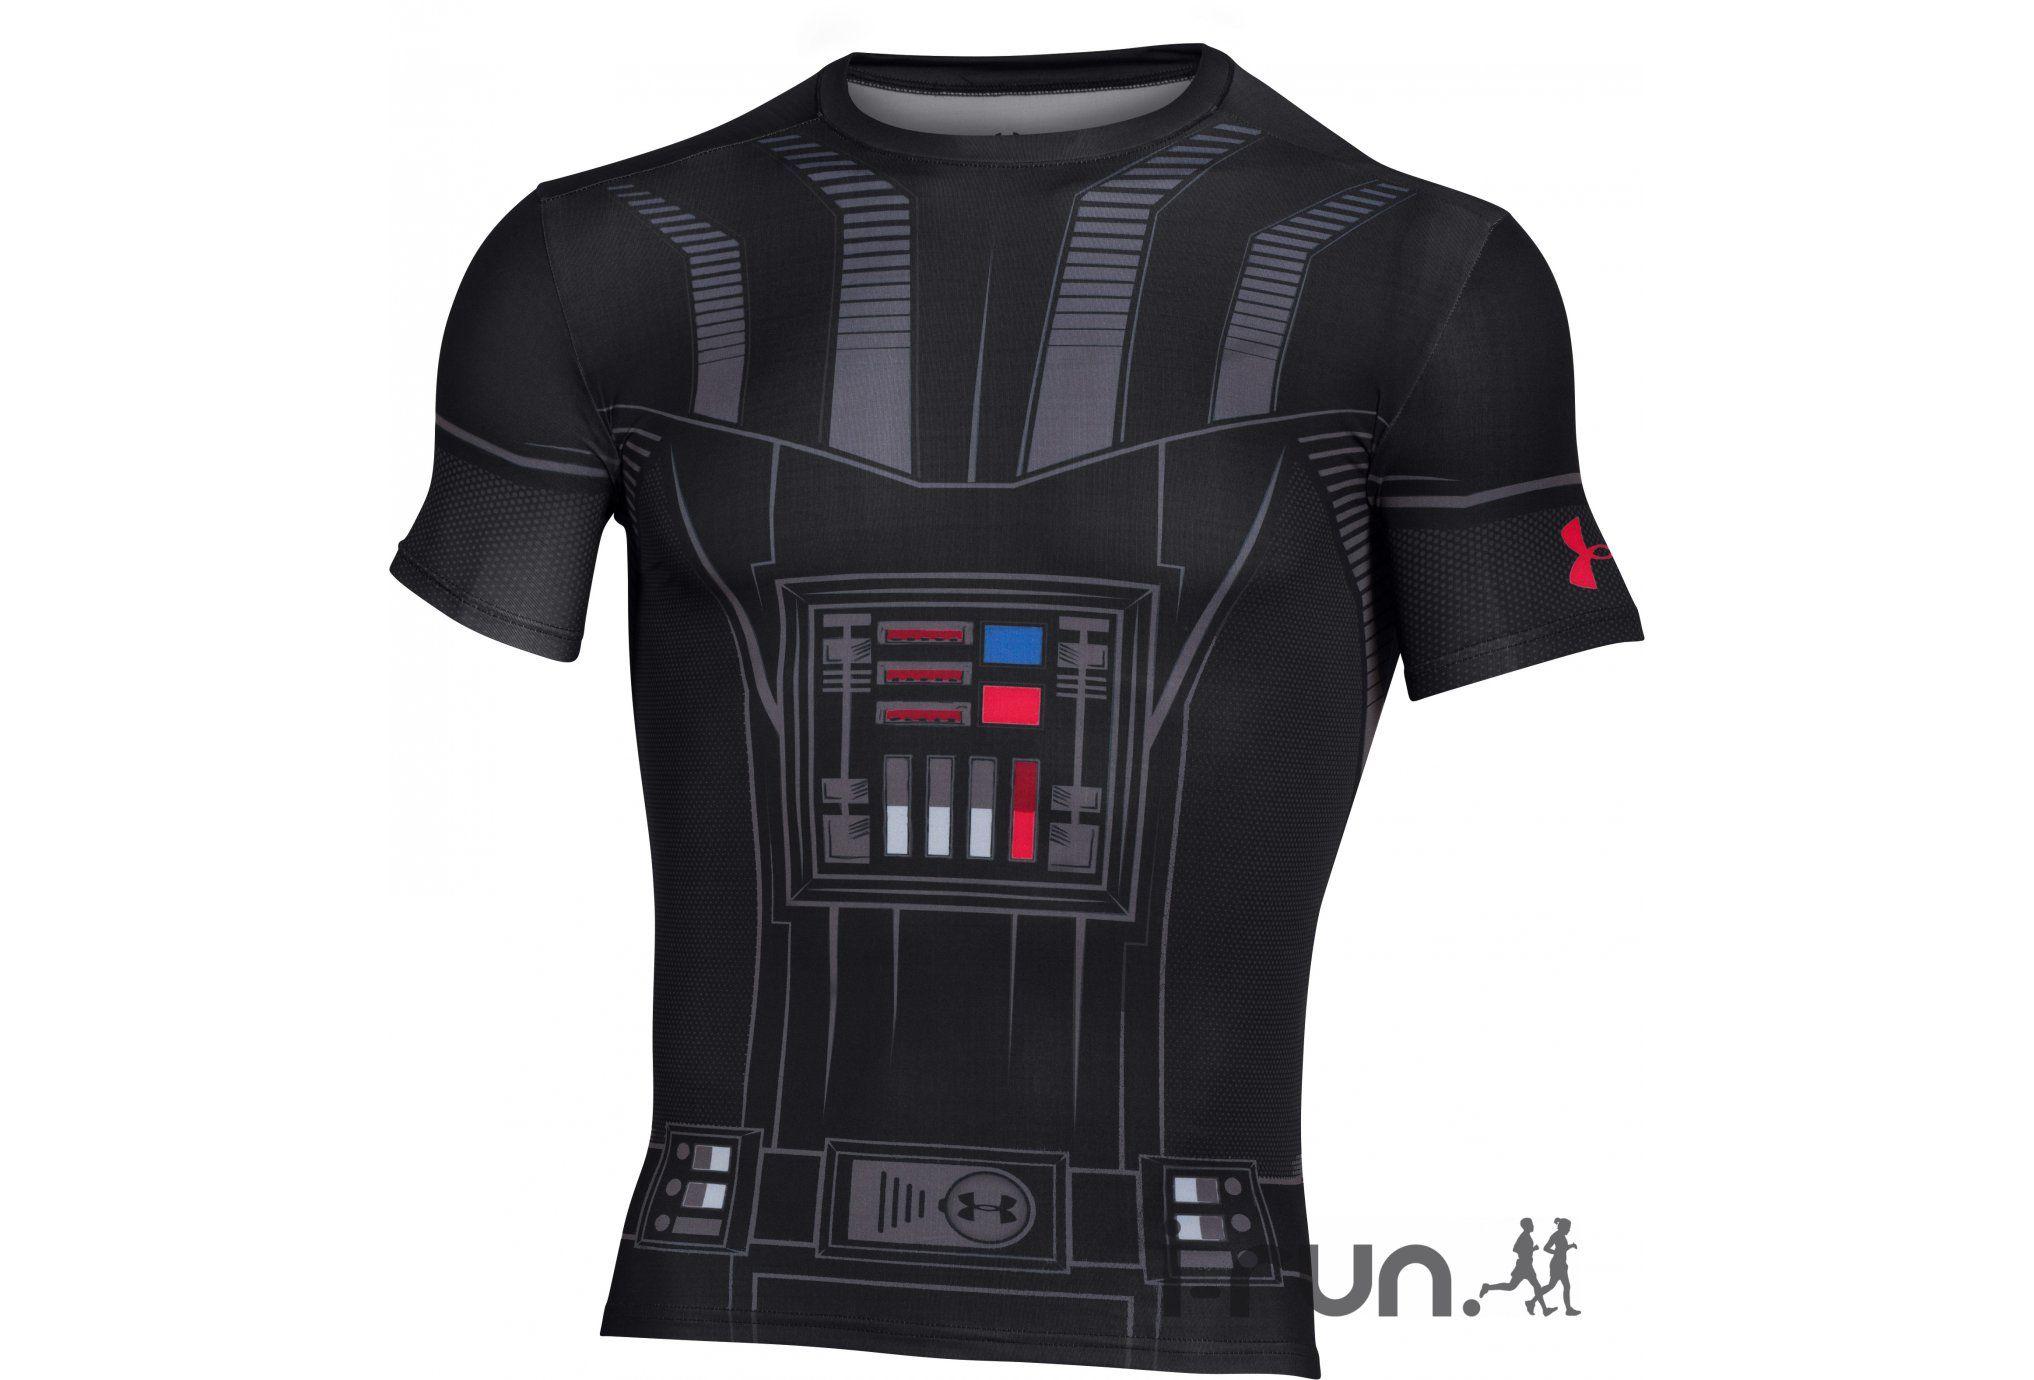 Under Armour Tee-shirt Star Wars UA Vader Compression M - Vêtements homme running Compression Under Armour Tee-shirt Star Wars UA Vader Compression M